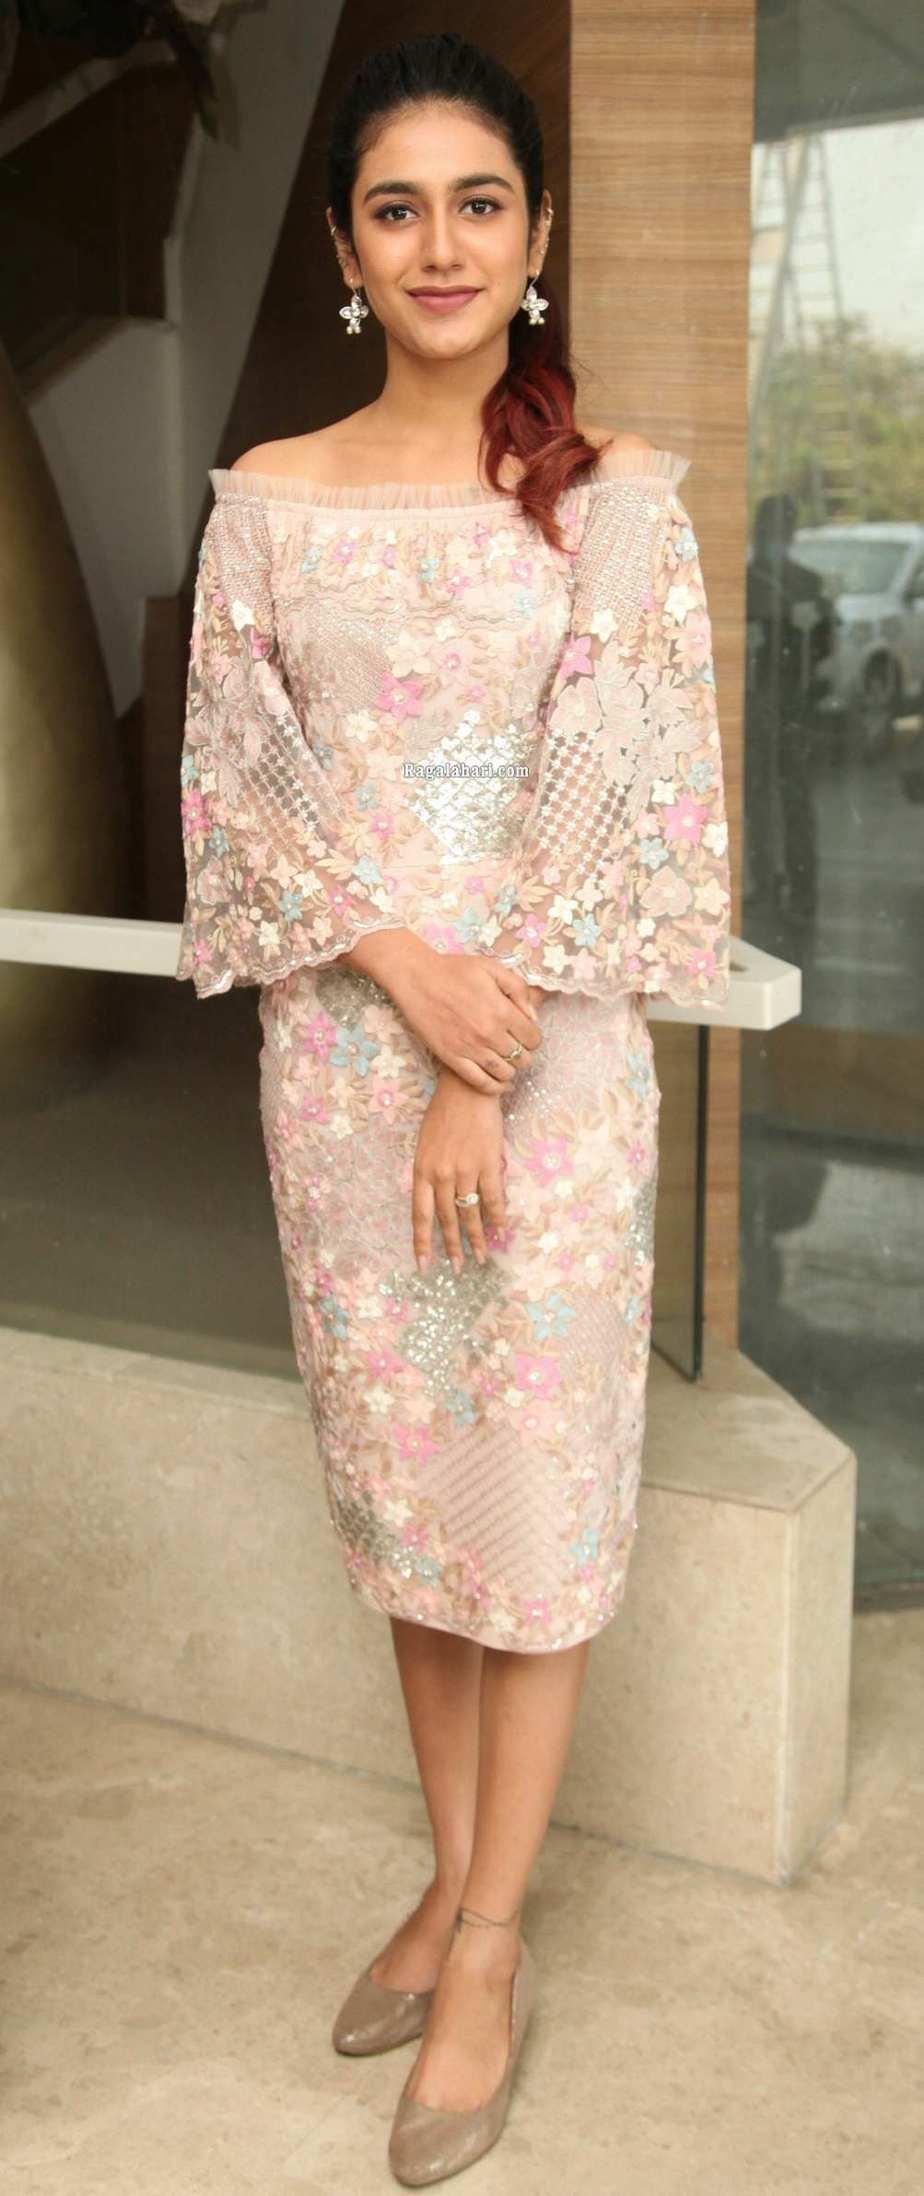 Priya Prakash Varrier in peach dress for check press meet1.2